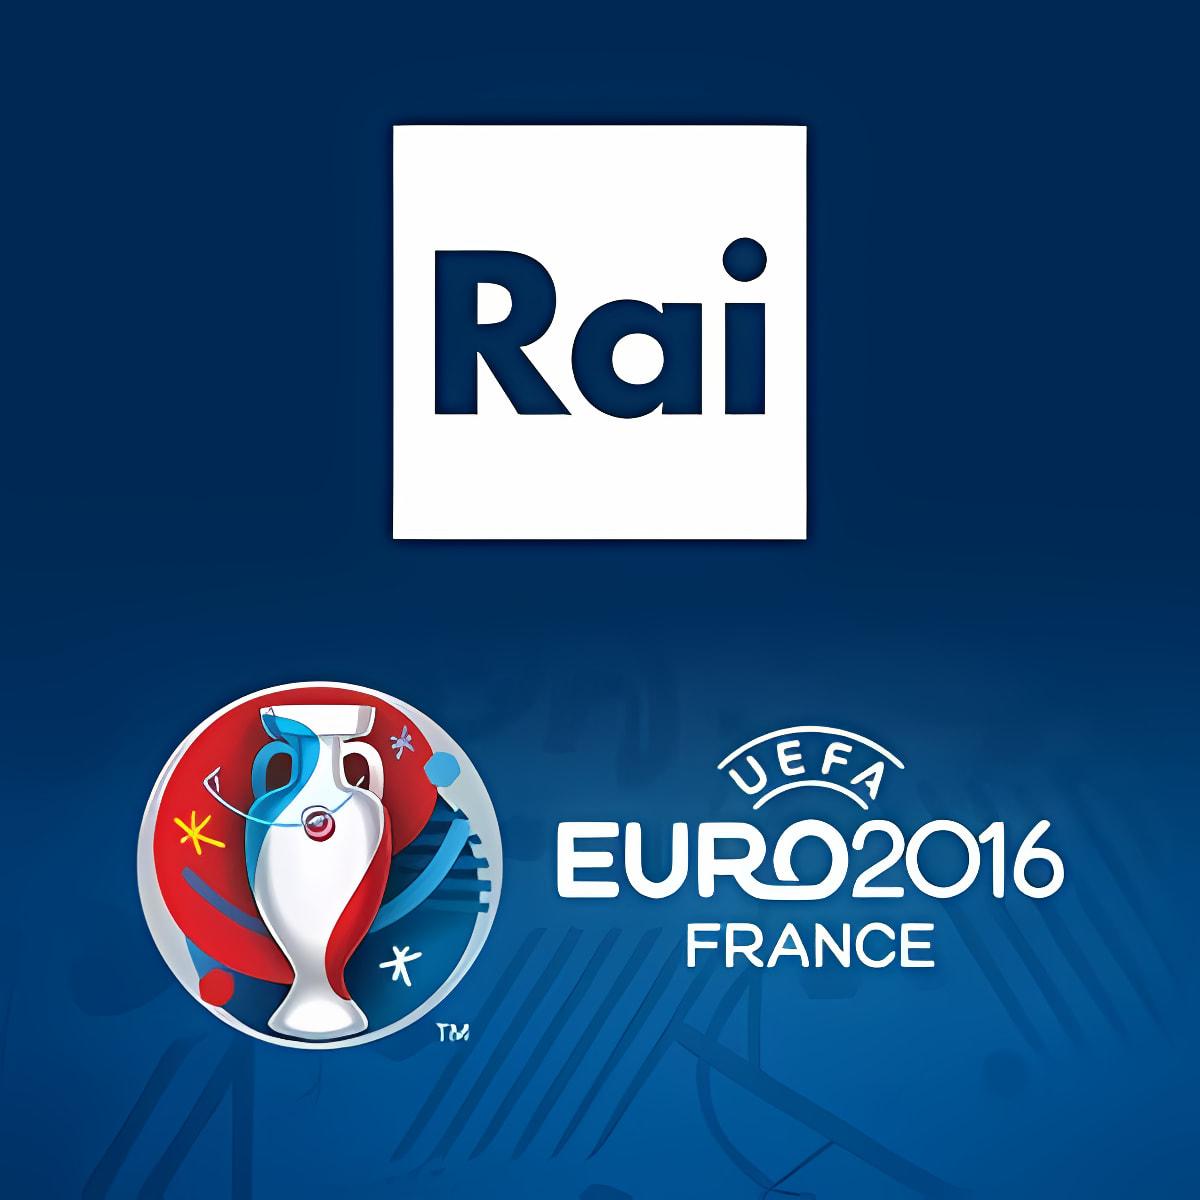 Rai Euro2016